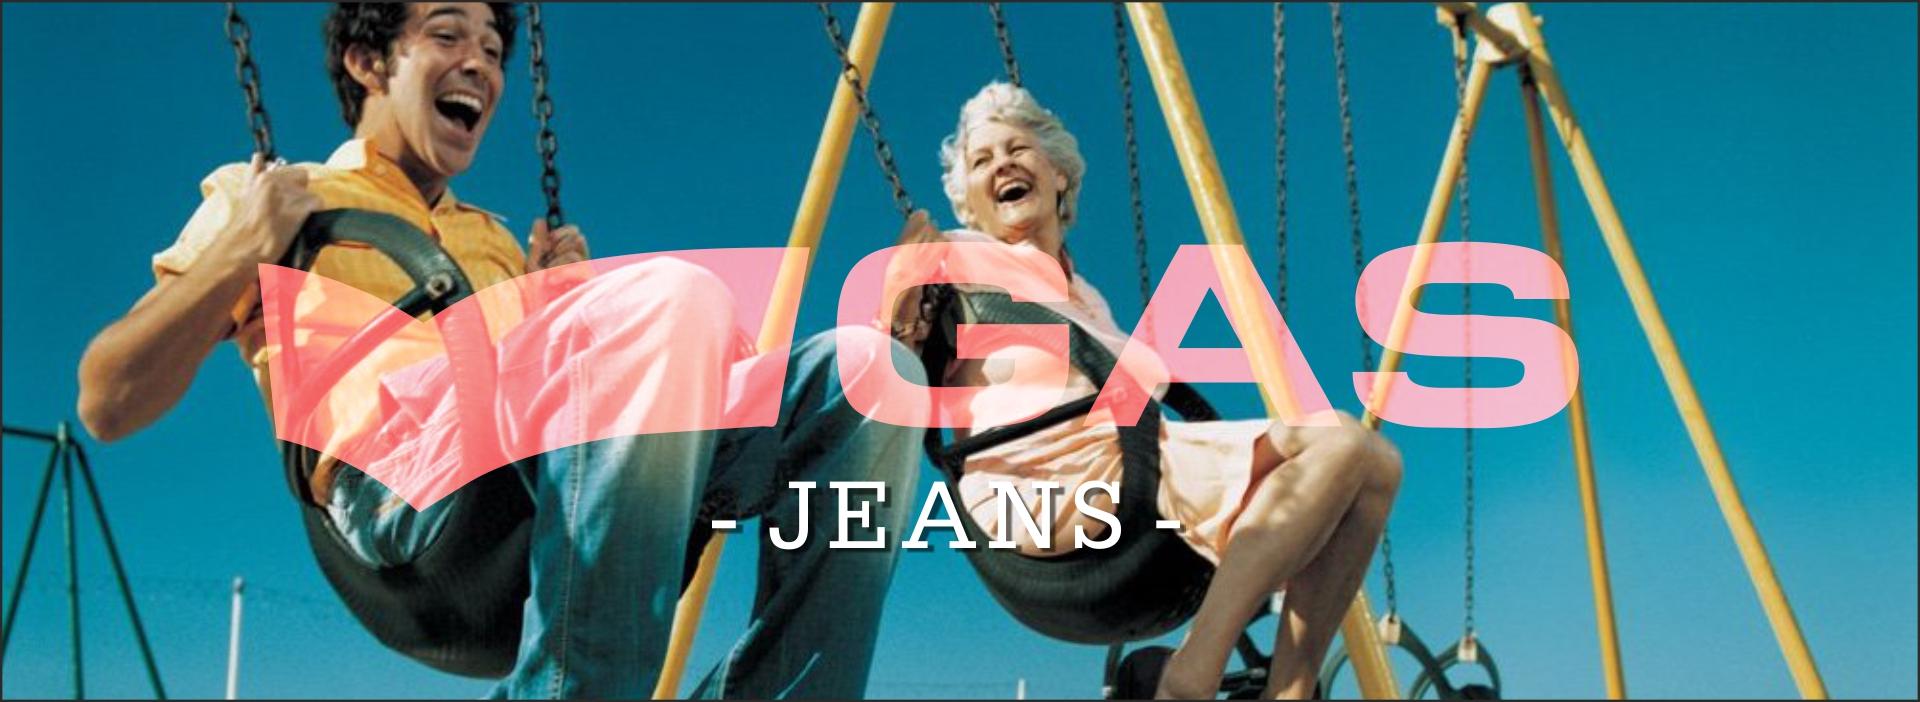 gas jeanswear più di una scelta di look banner-home